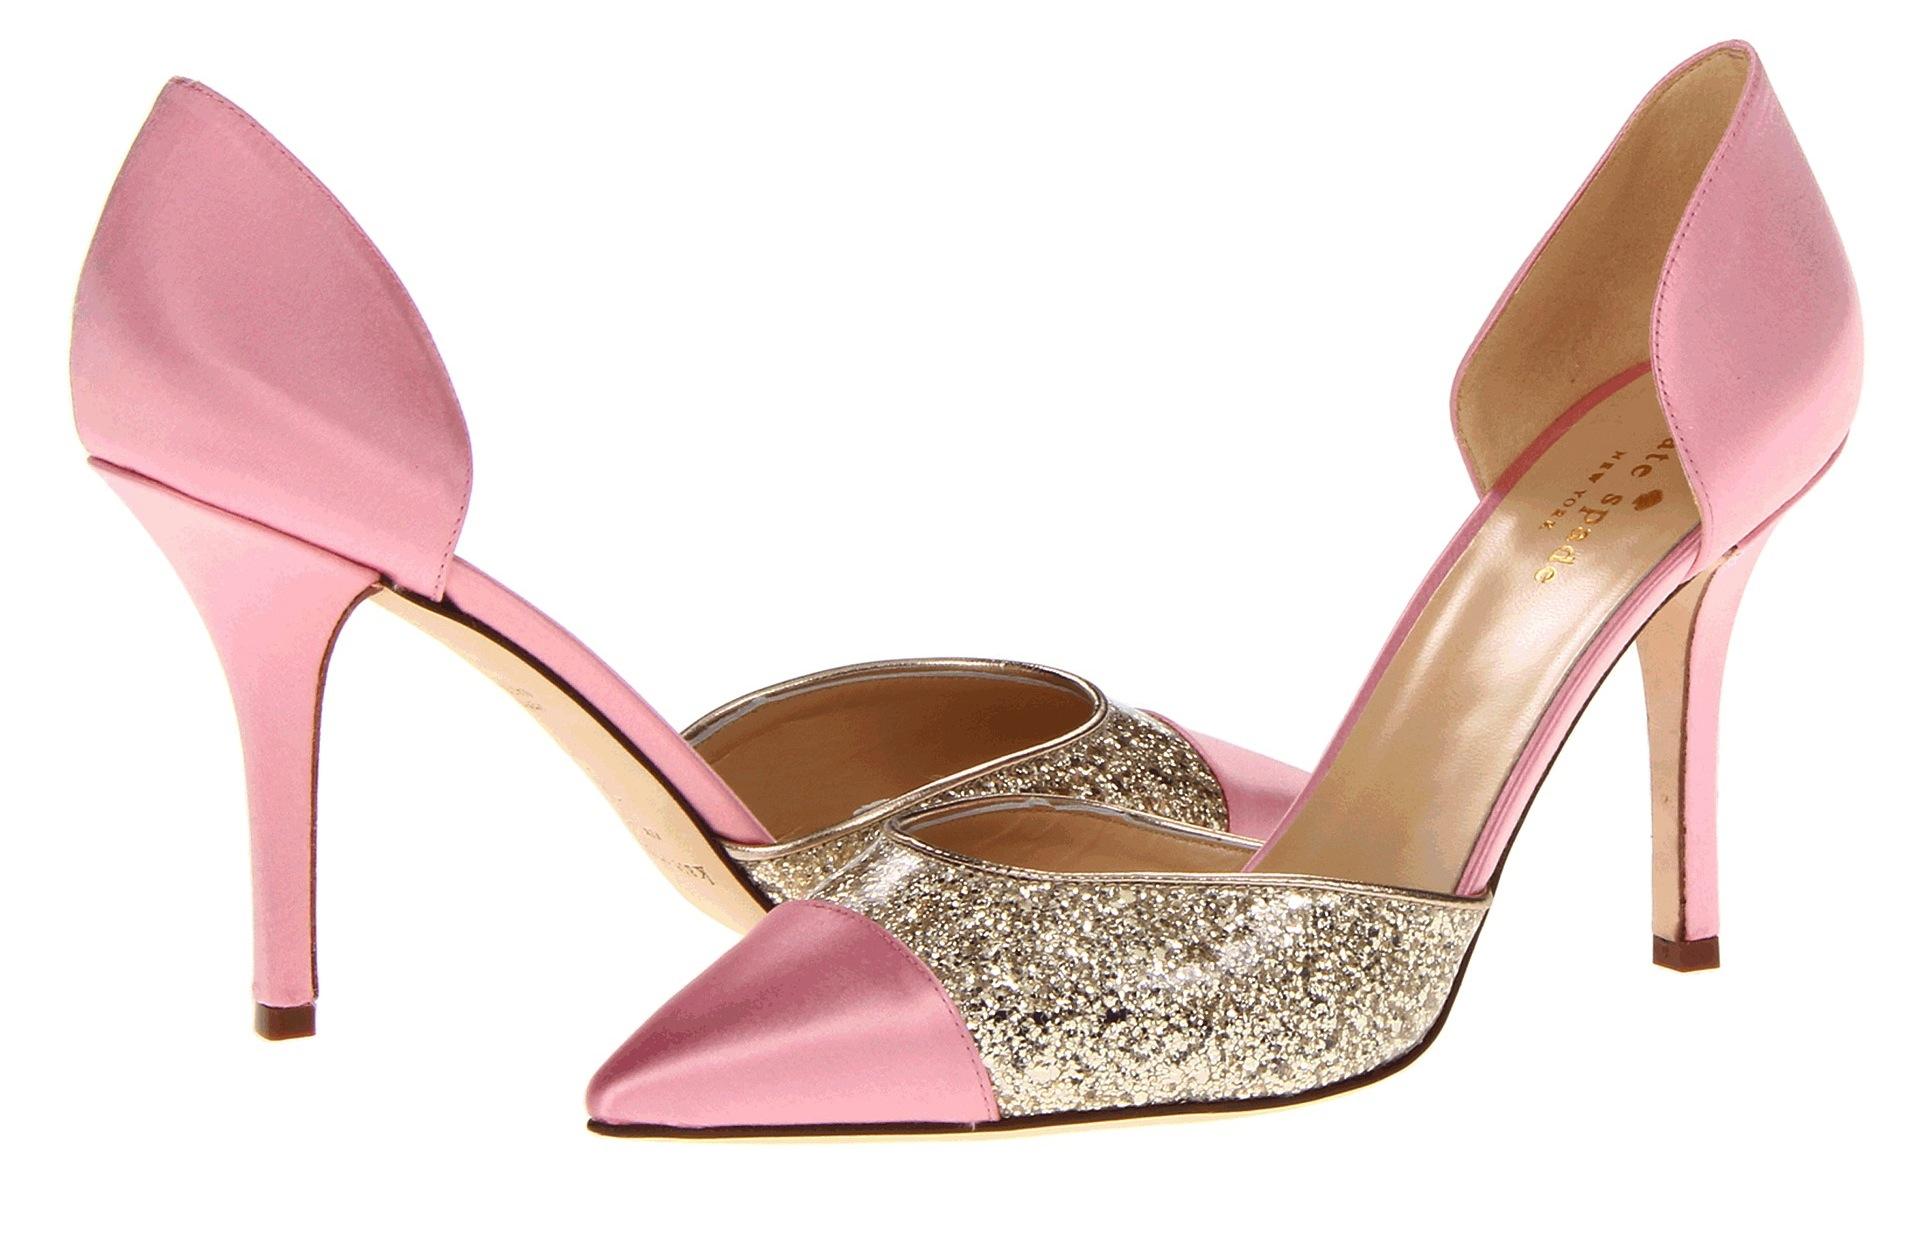 Blush Pink Weding Shoes 026 - Blush Pink Weding Shoes